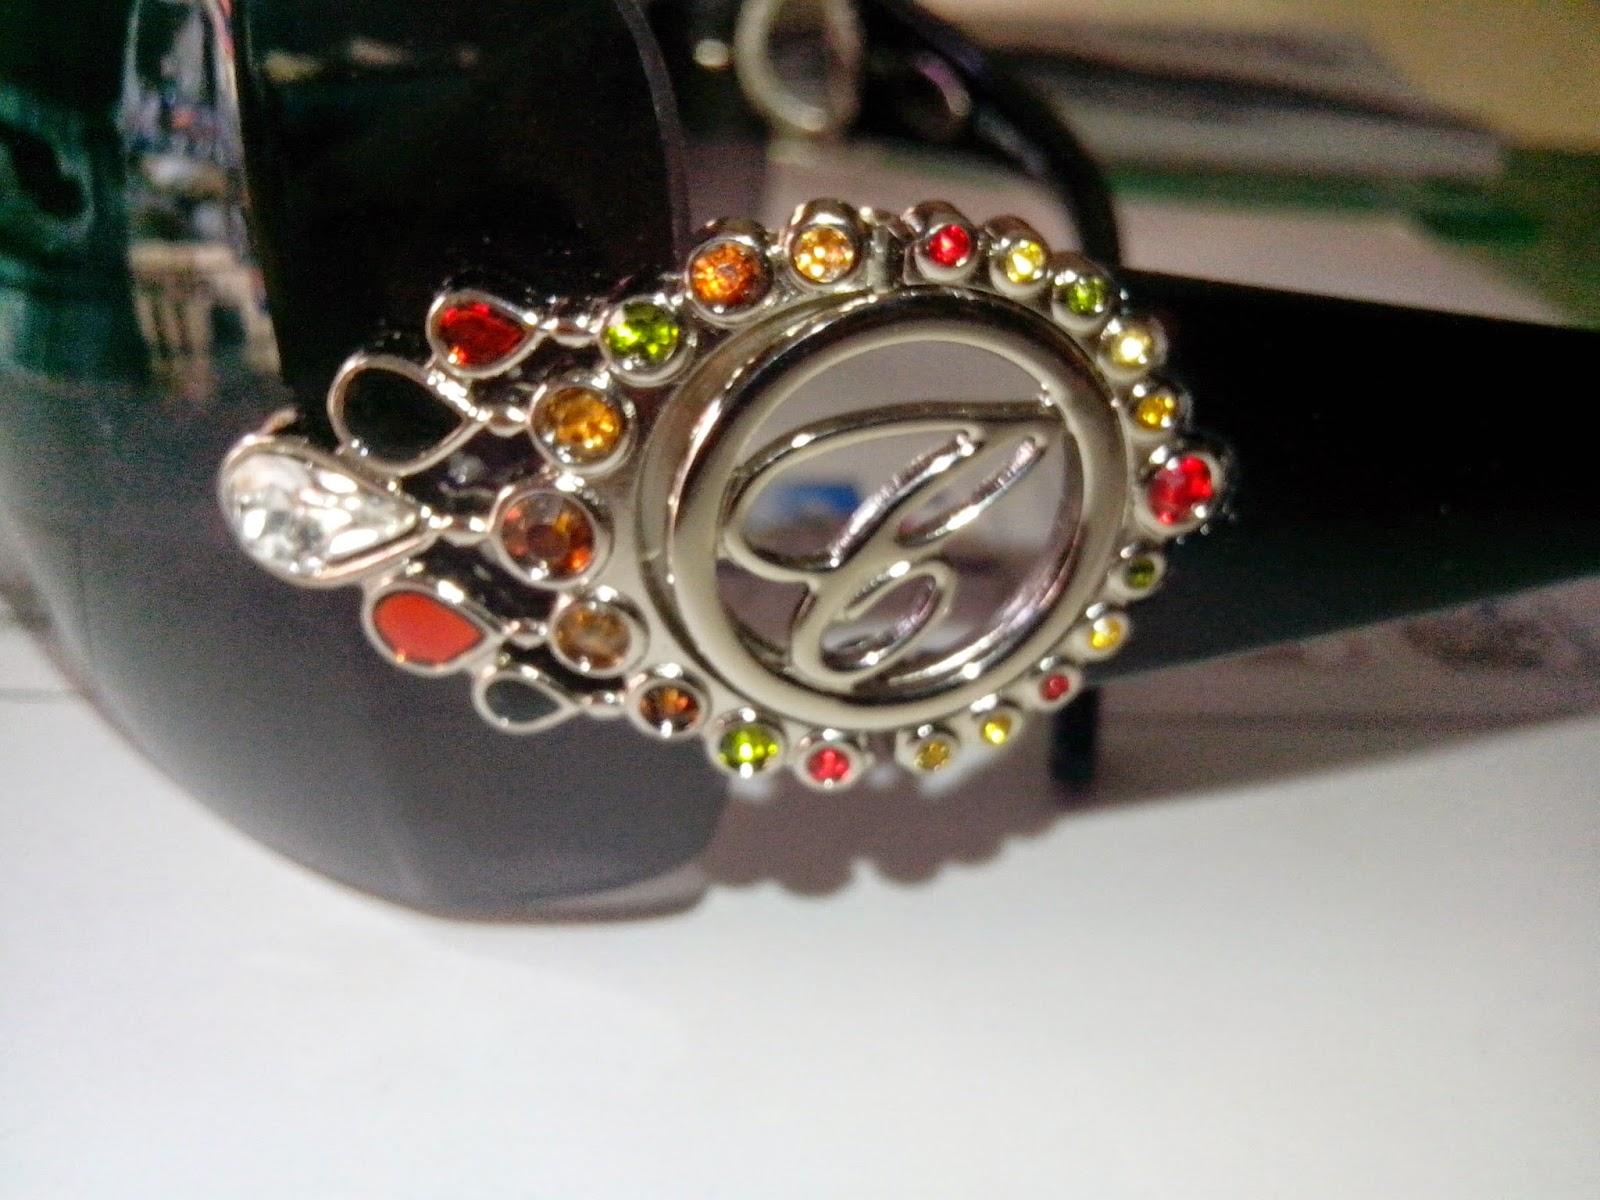 a3365b5717 Chopard Sunglasses Ladies Price 6500 pk Rs